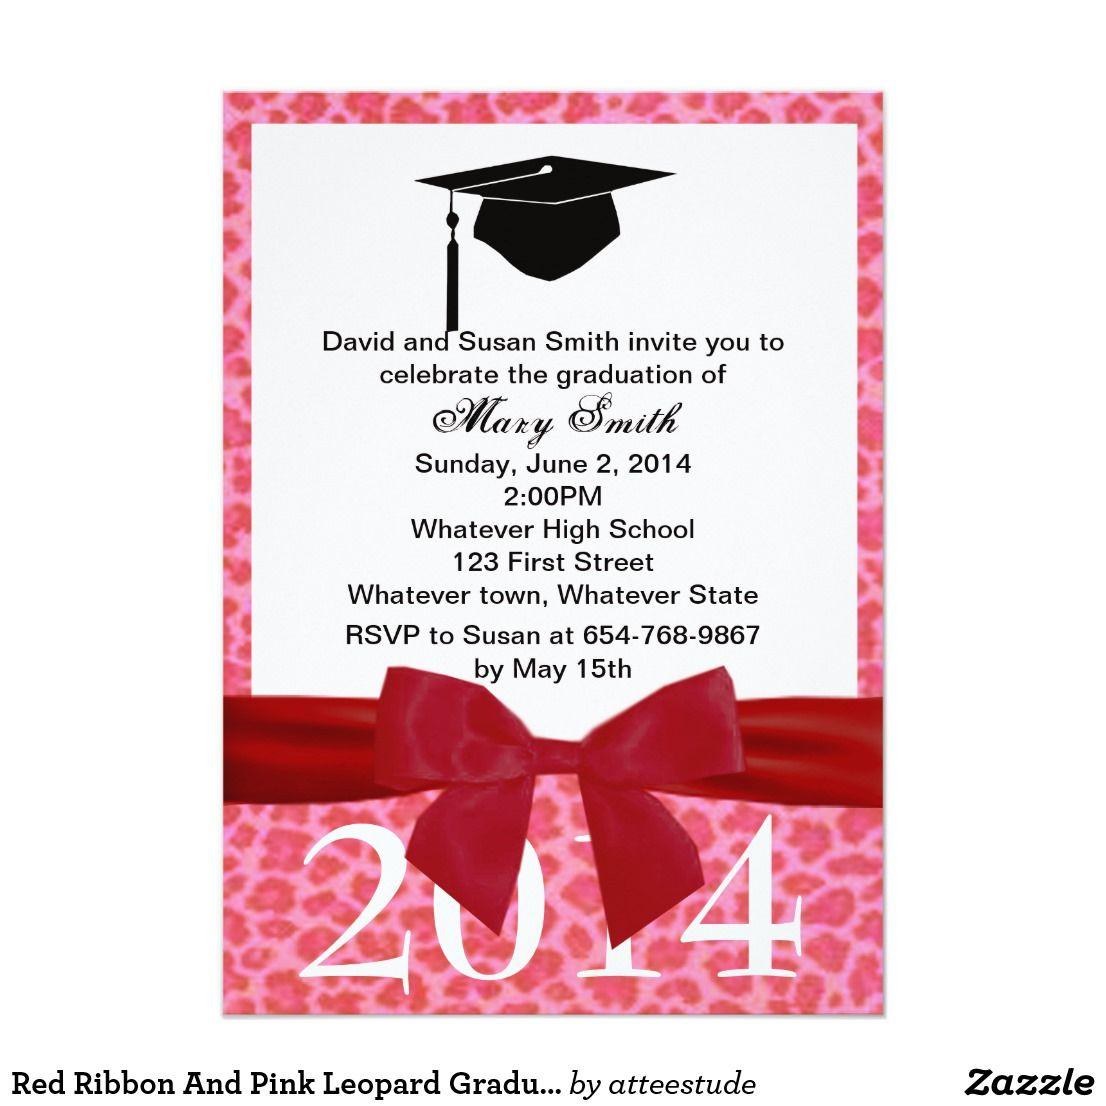 Red Ribbon And Pink Leopard Graduation Invitation